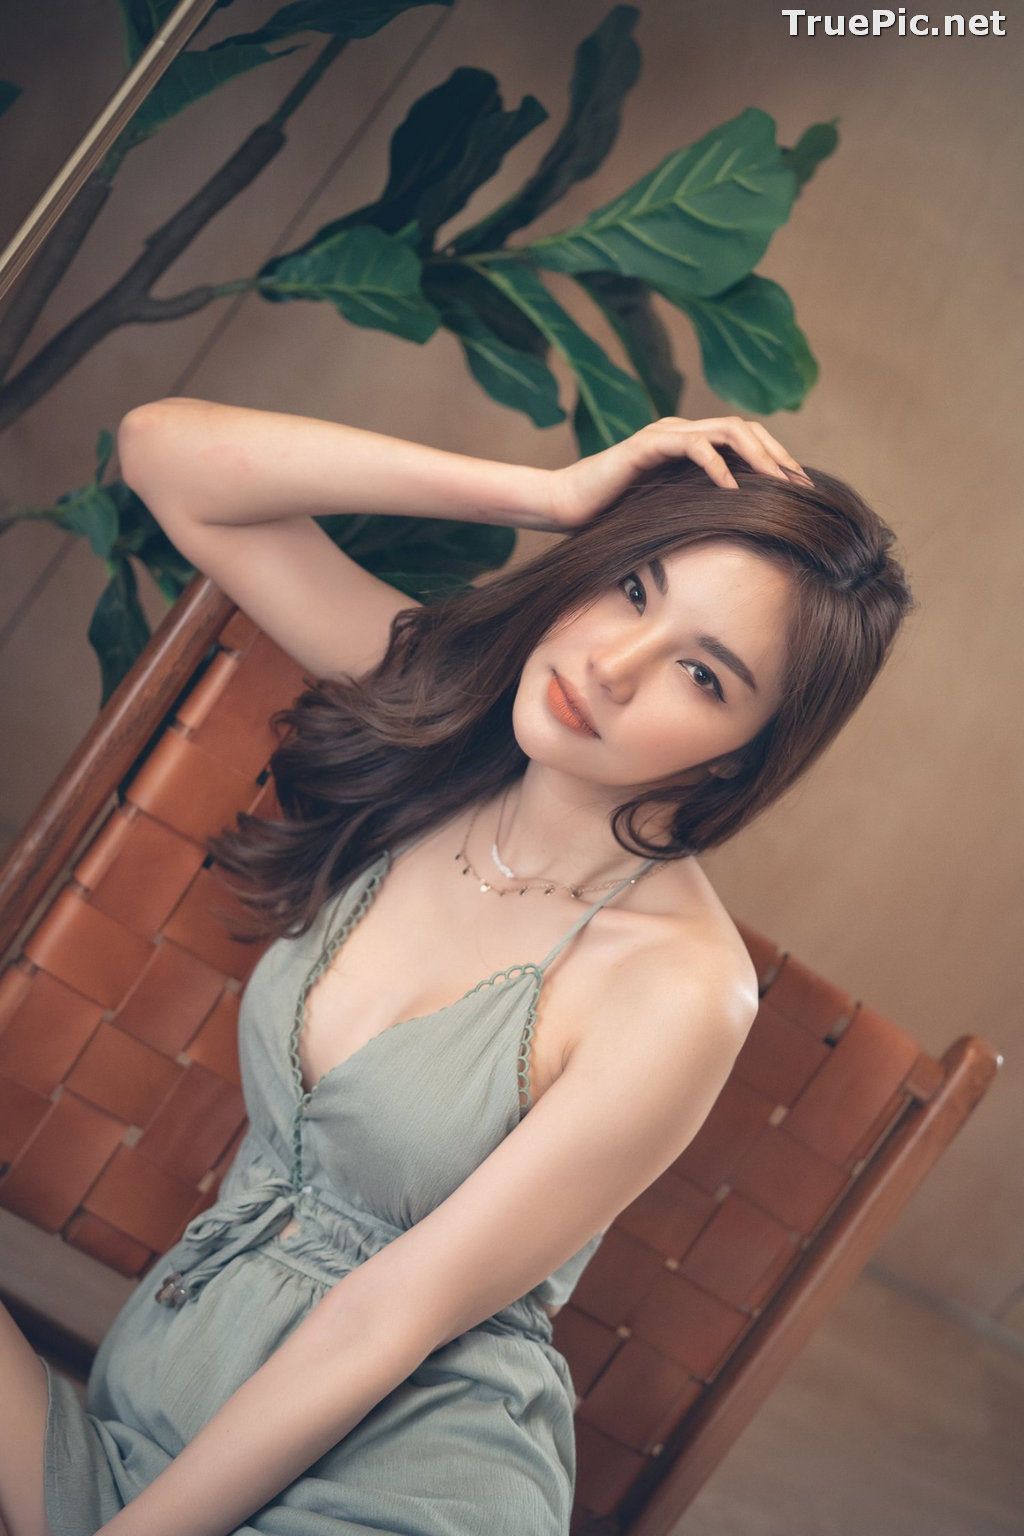 Image Thailand Model – Jarunan Tavepanya – Beautiful Picture 2020 Collection - TruePic.net - Picture-2